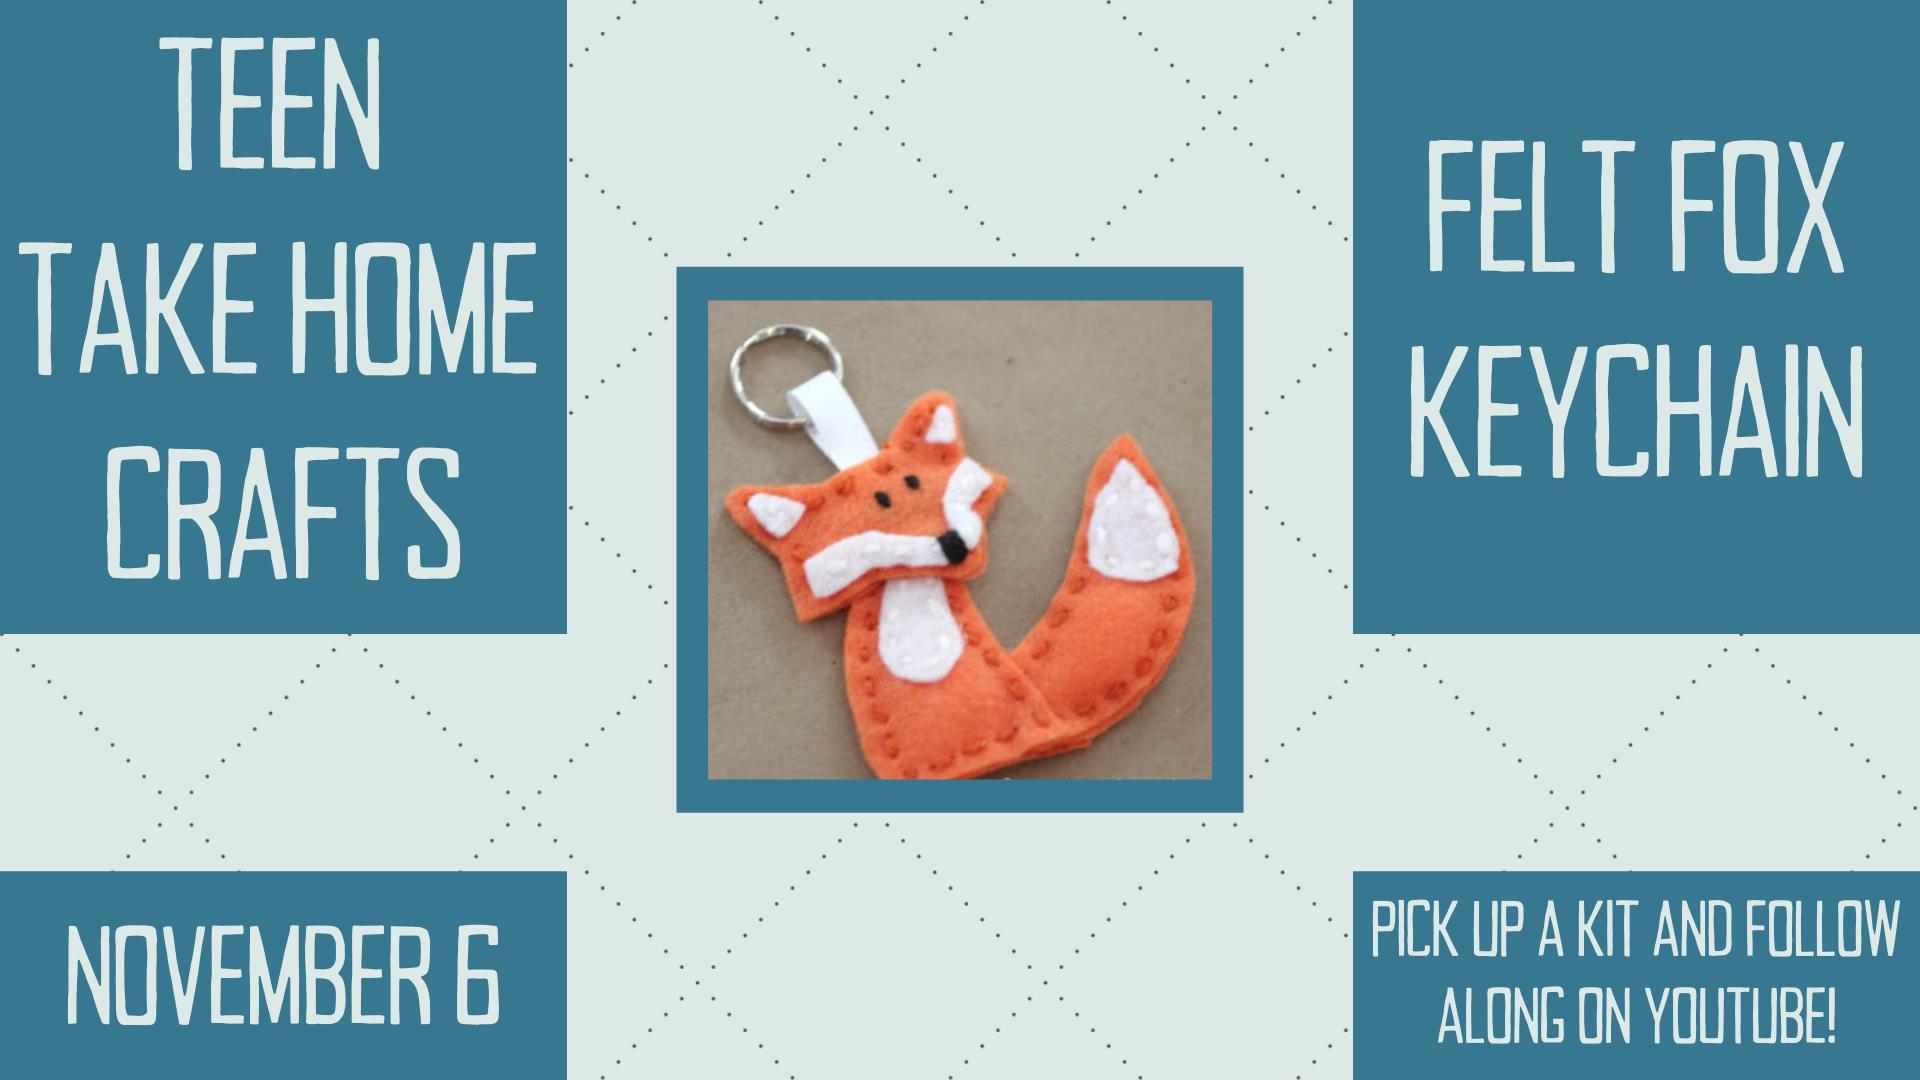 Teen Take Home Craft: Felt Fox Keychain